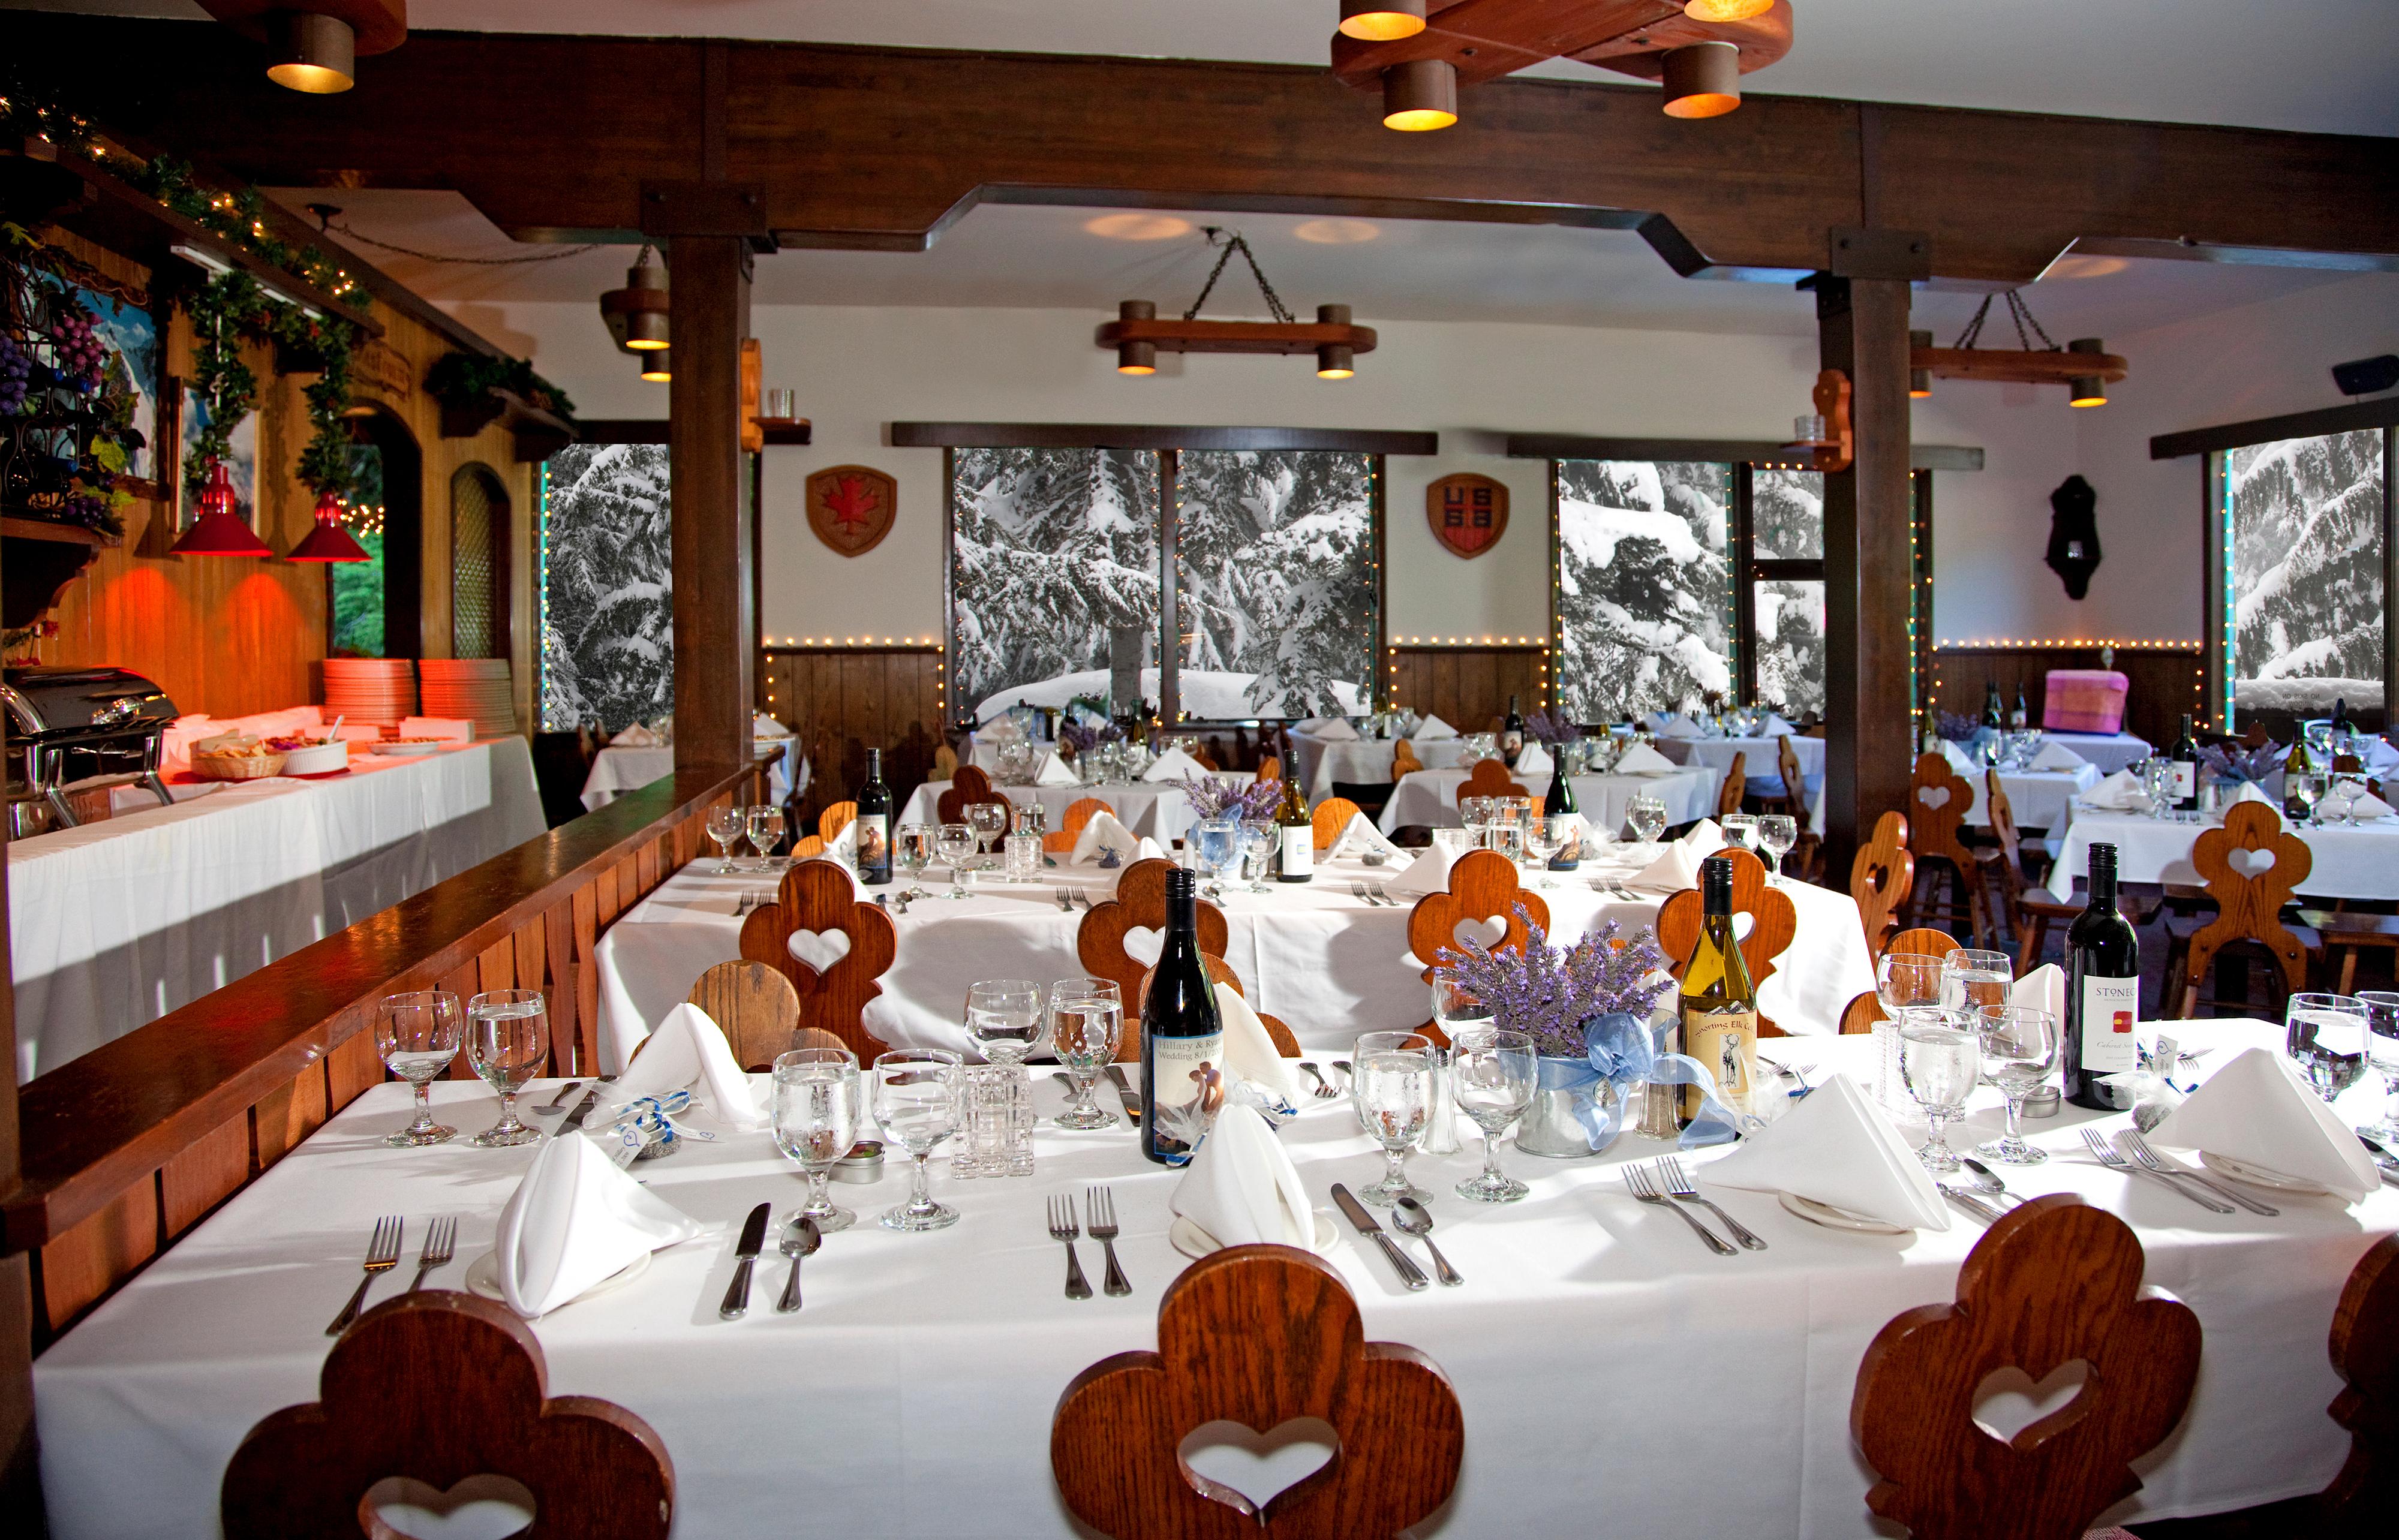 Alpine_restaurant__white_tablecloth._jeff_caven_thumb